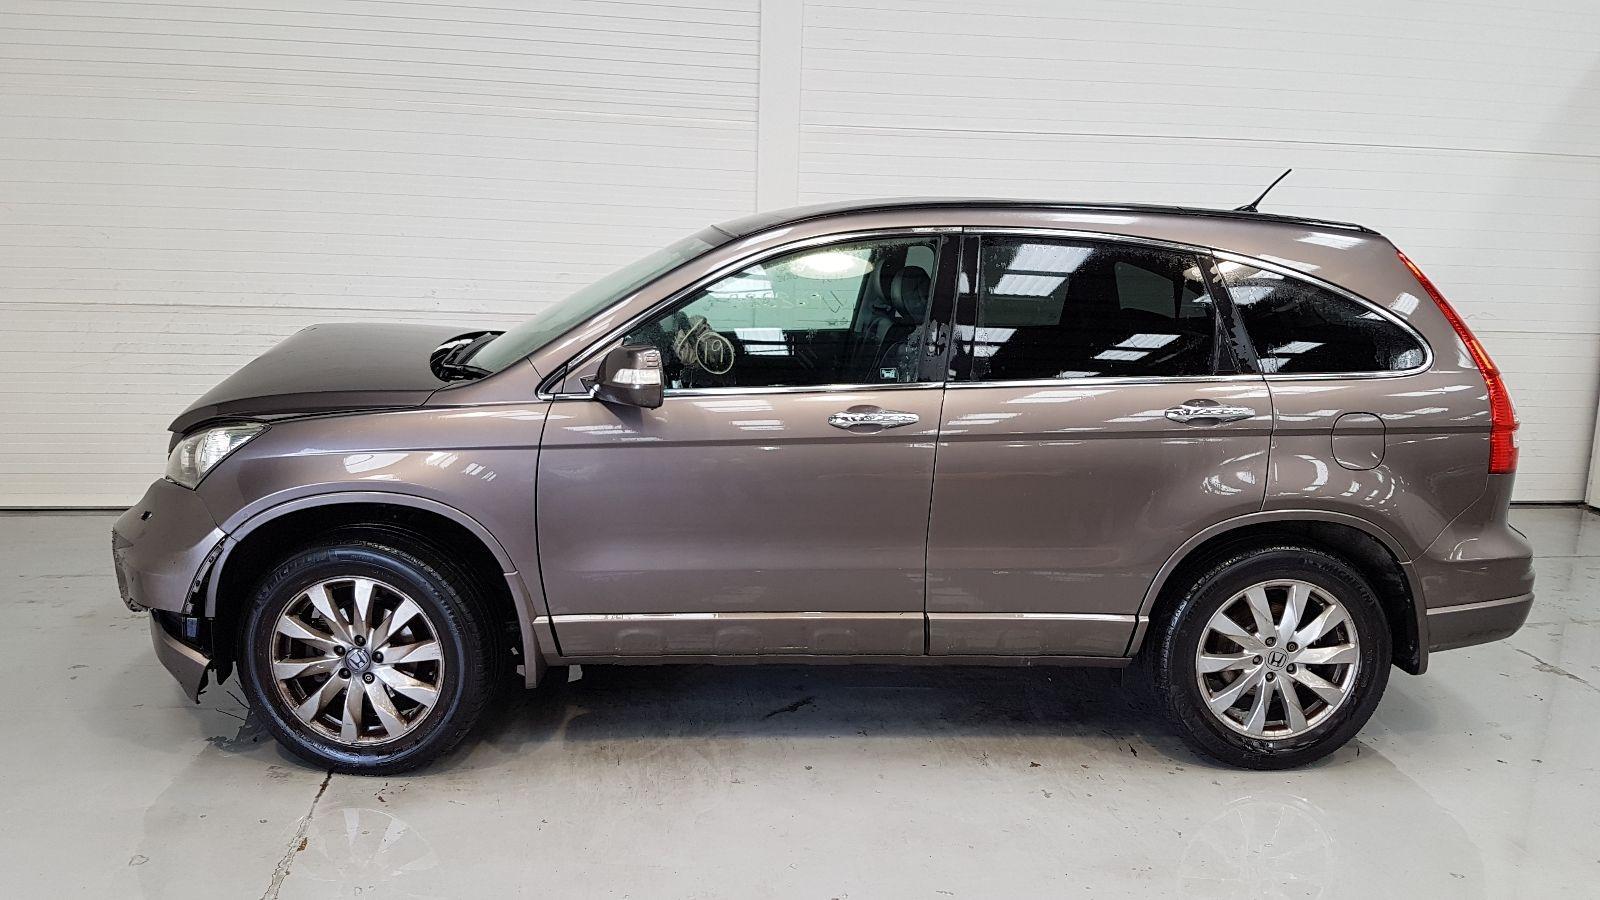 View Auto part Honda Crv 2012 5 Door Estate